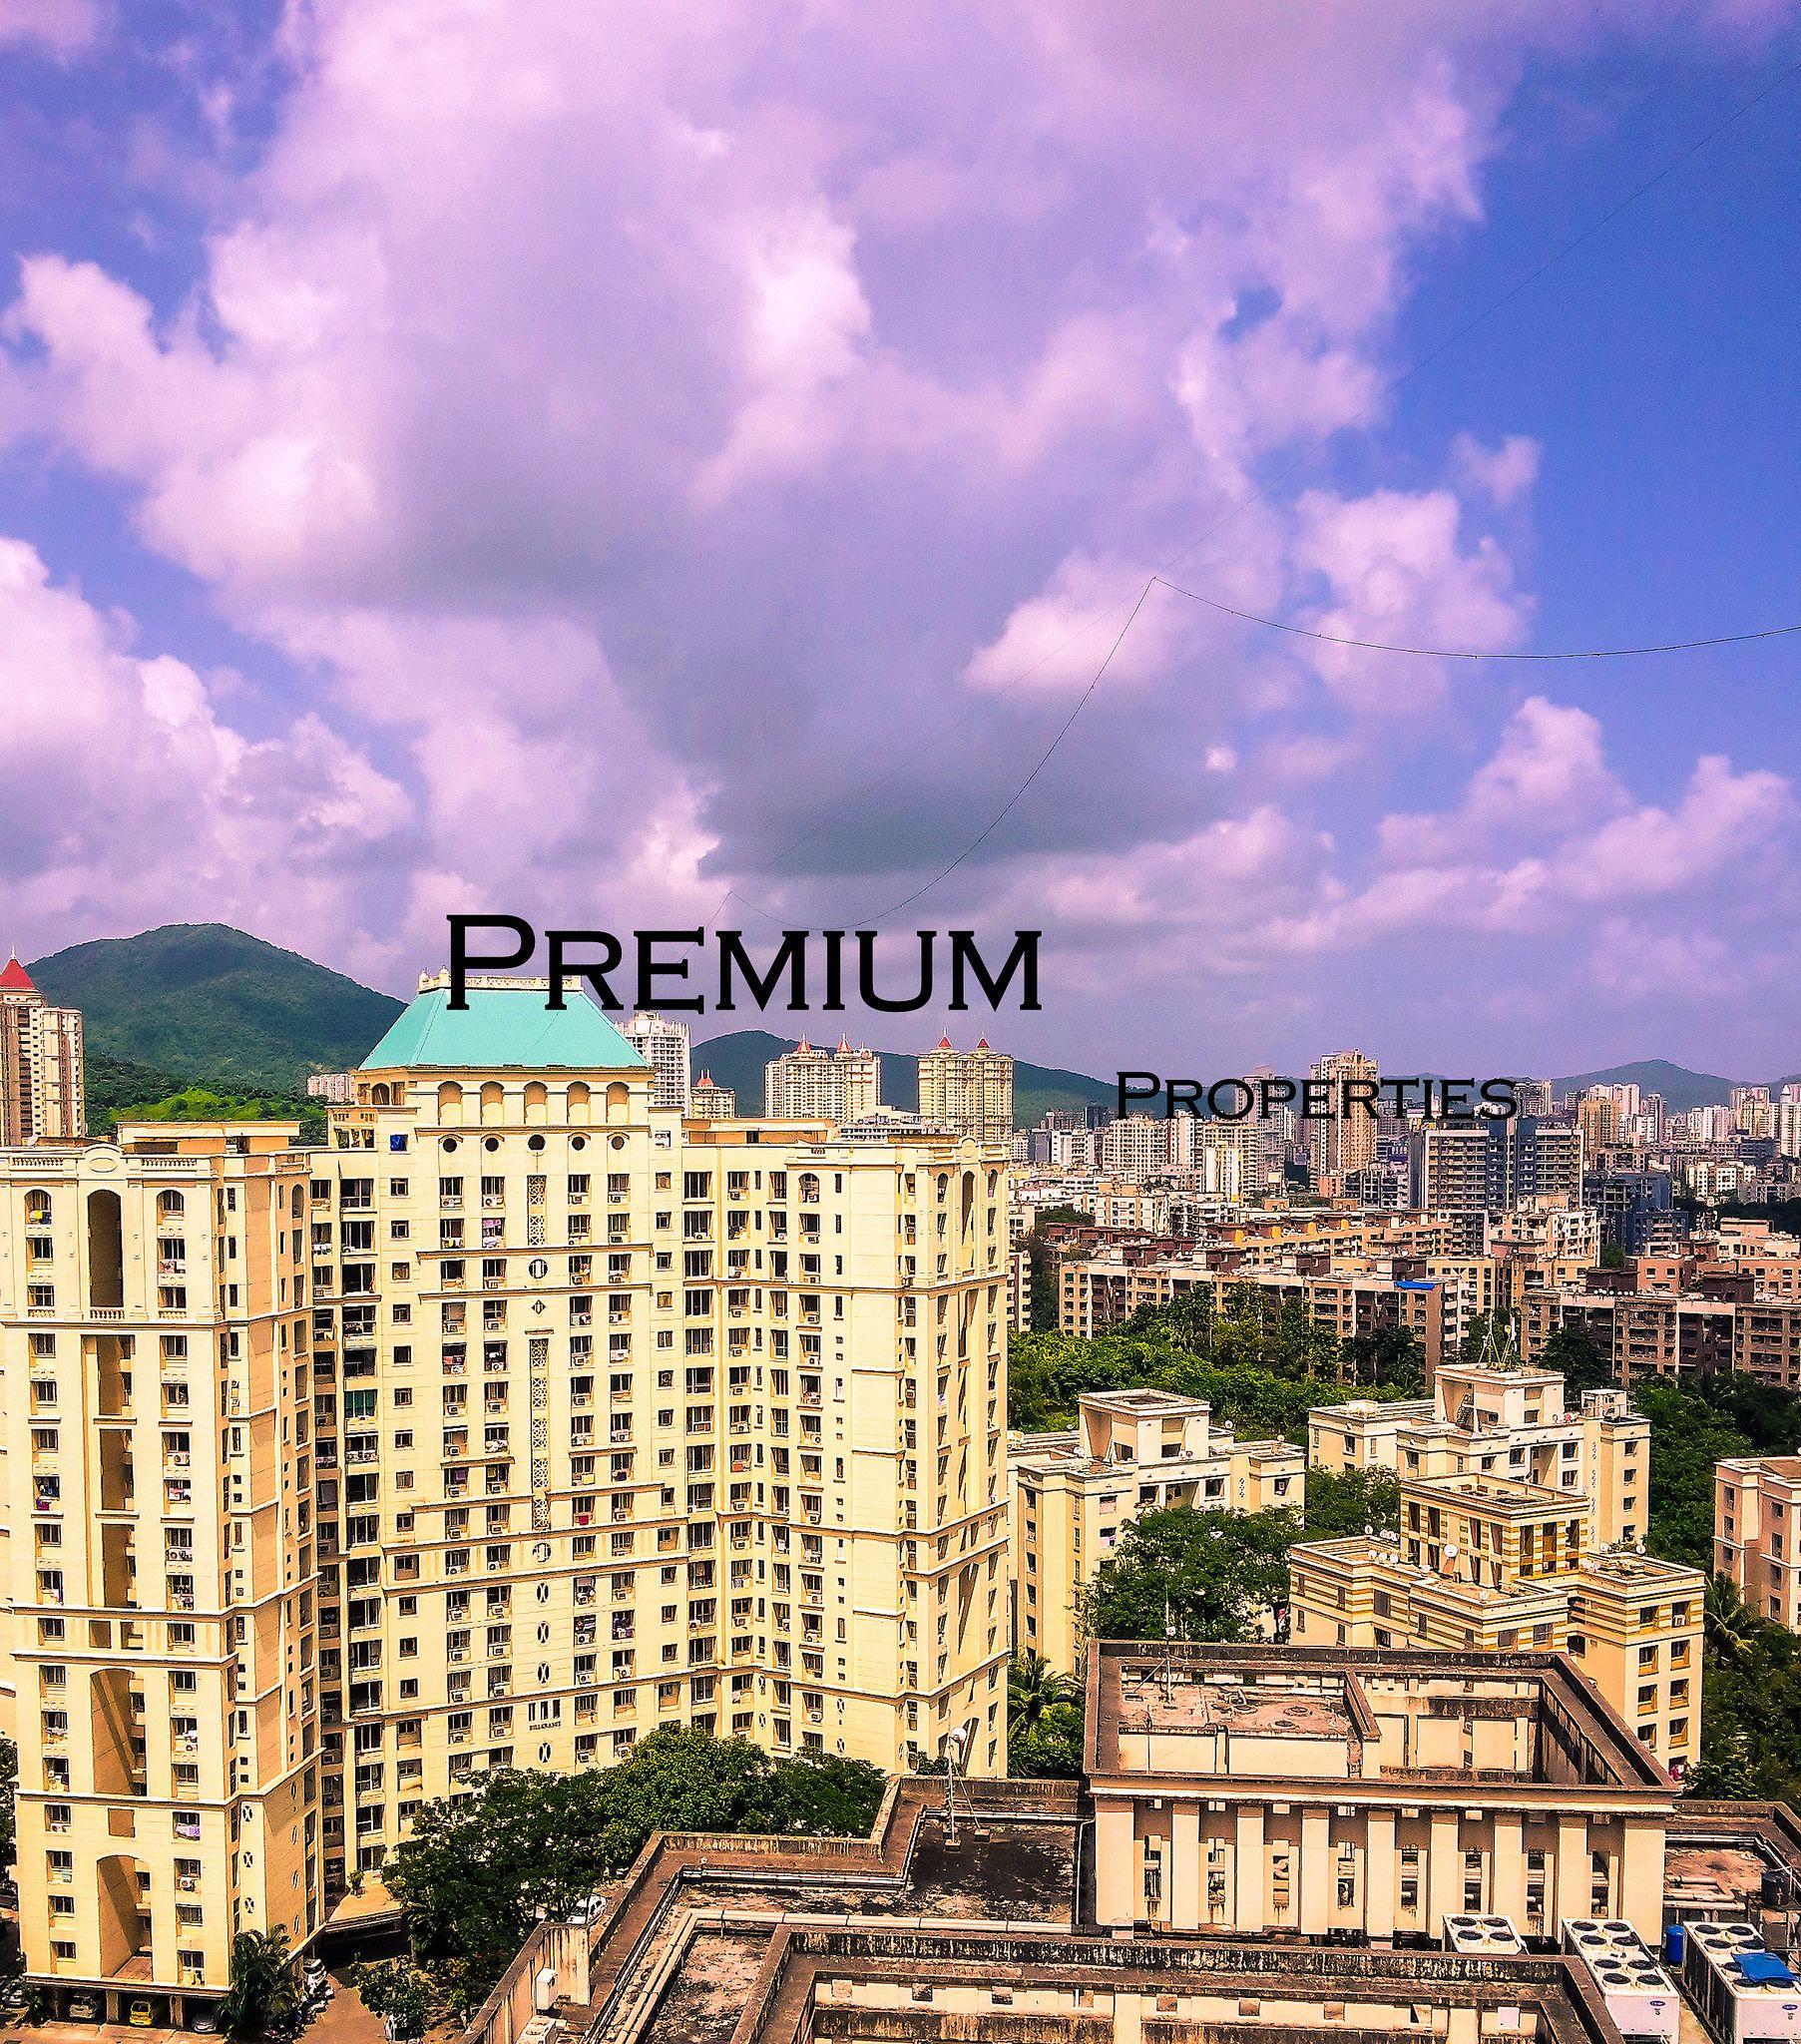 Prithviraj Singha | Apartments for sale, Luxury condo ...